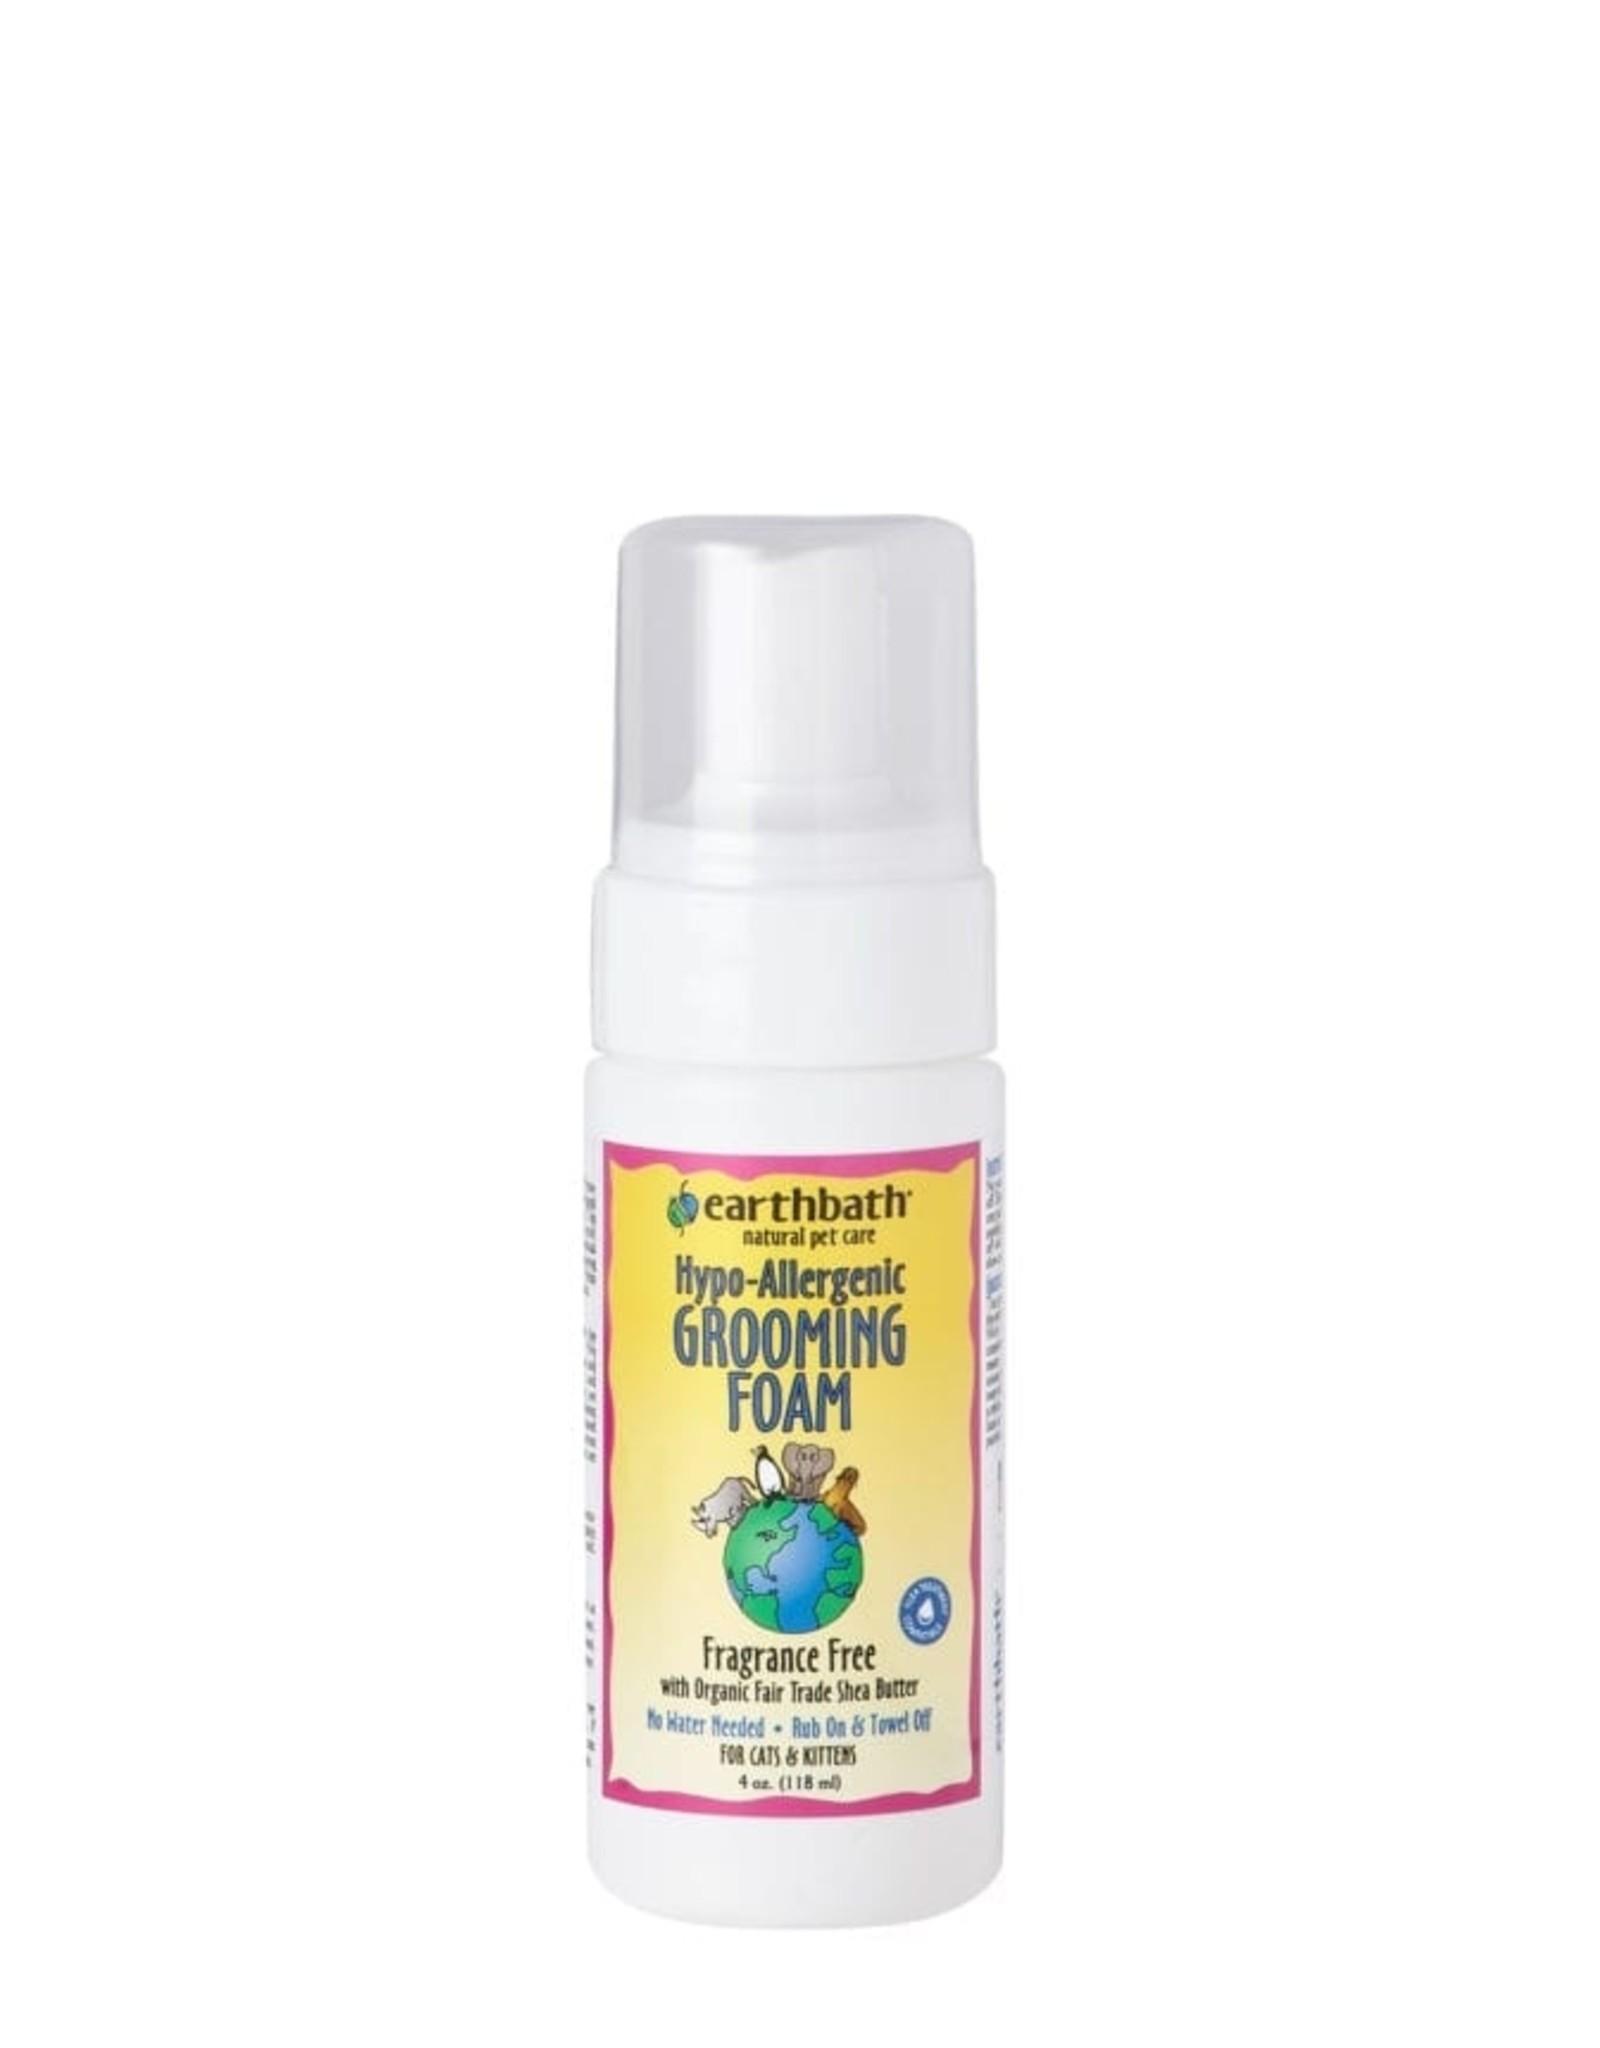 Earthbath Earthbath Hypo-Allergenic Grooming Foam for Cats 4oz